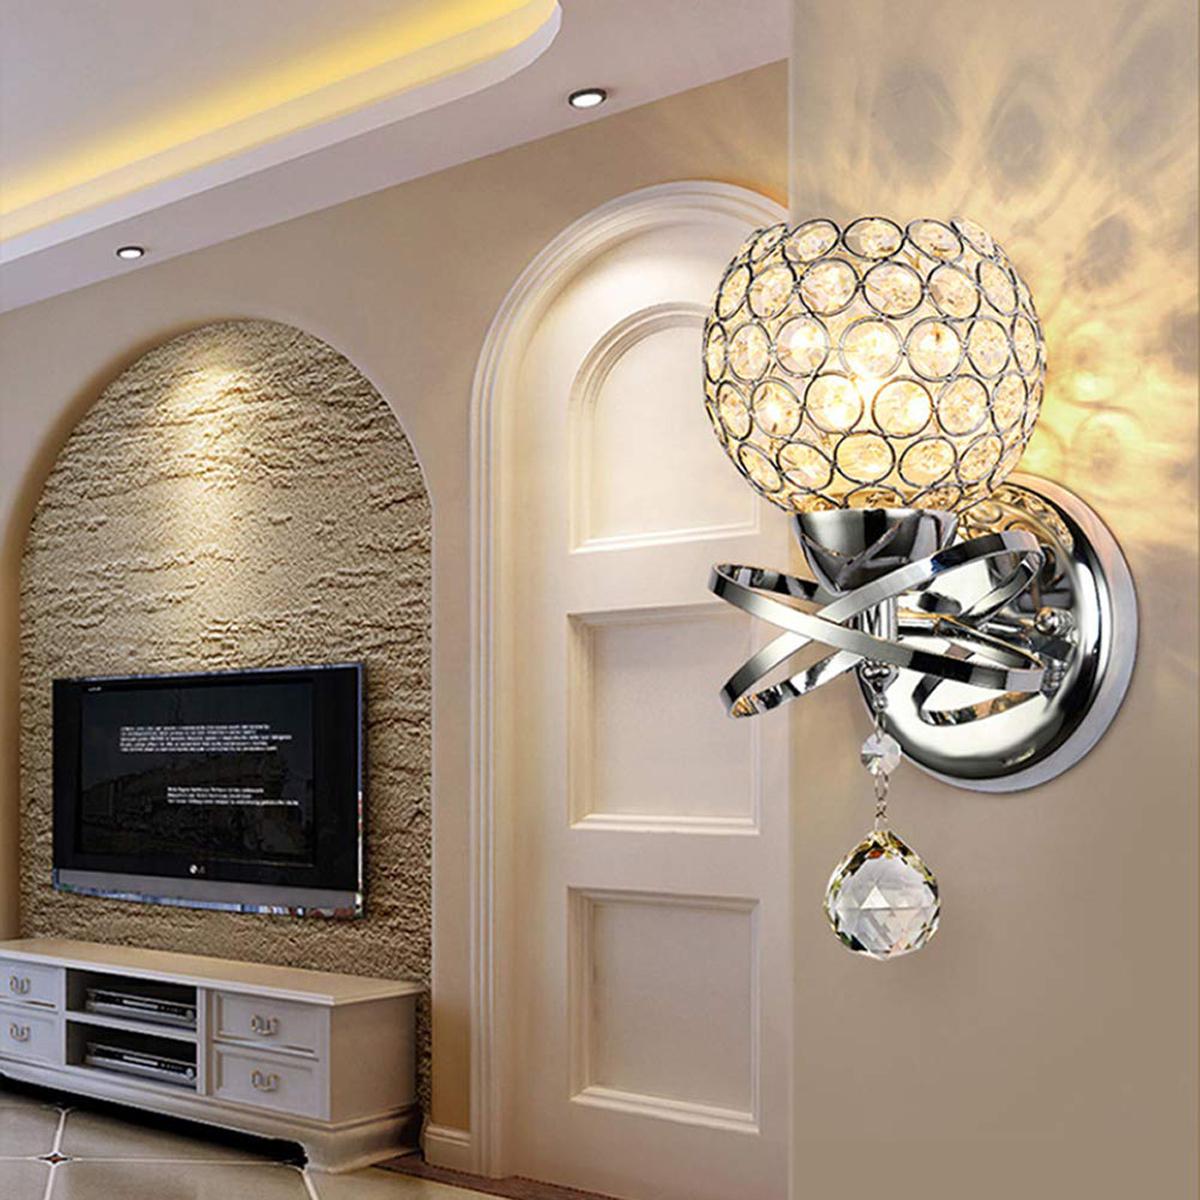 40 Led Modern Crystal Wall Lamp Sconce Light For Bedroom Hallway Sale Banggood Com Arrival Notice Arrival Notice